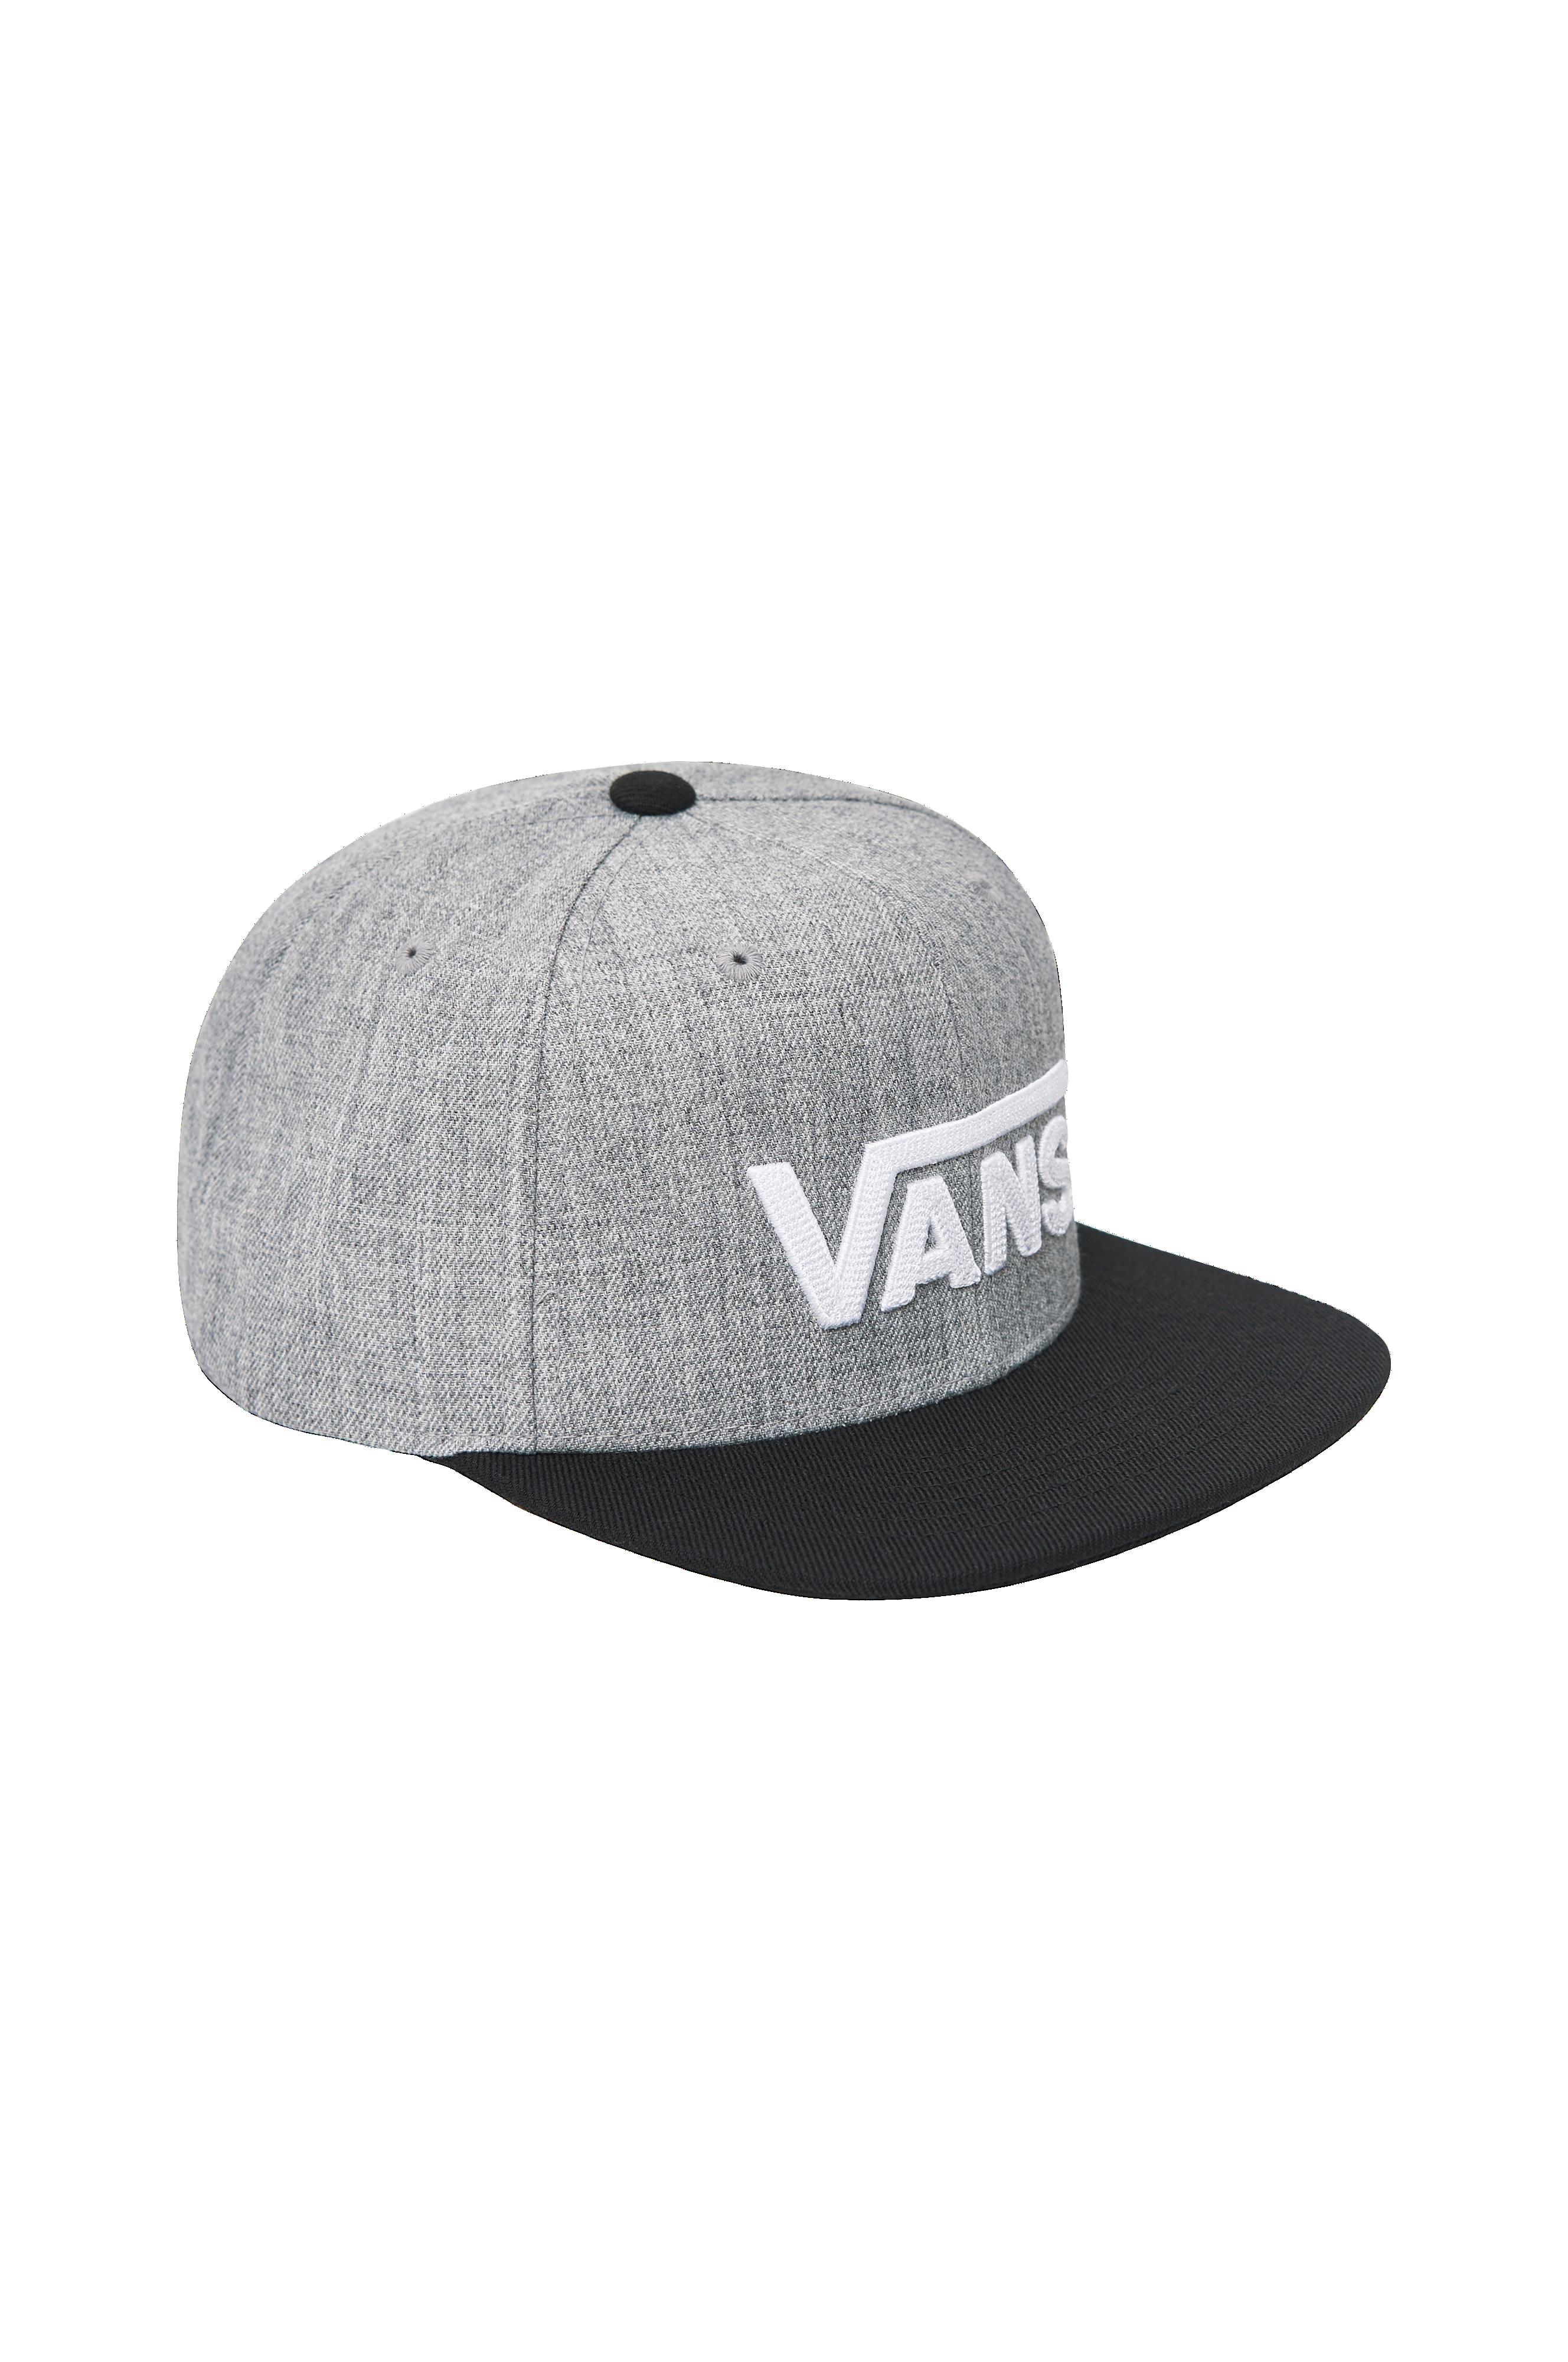 Vans Drop V Snapback Hat -lippis - Harmaa - Lapset - Ellos.fi ddbf4528d7